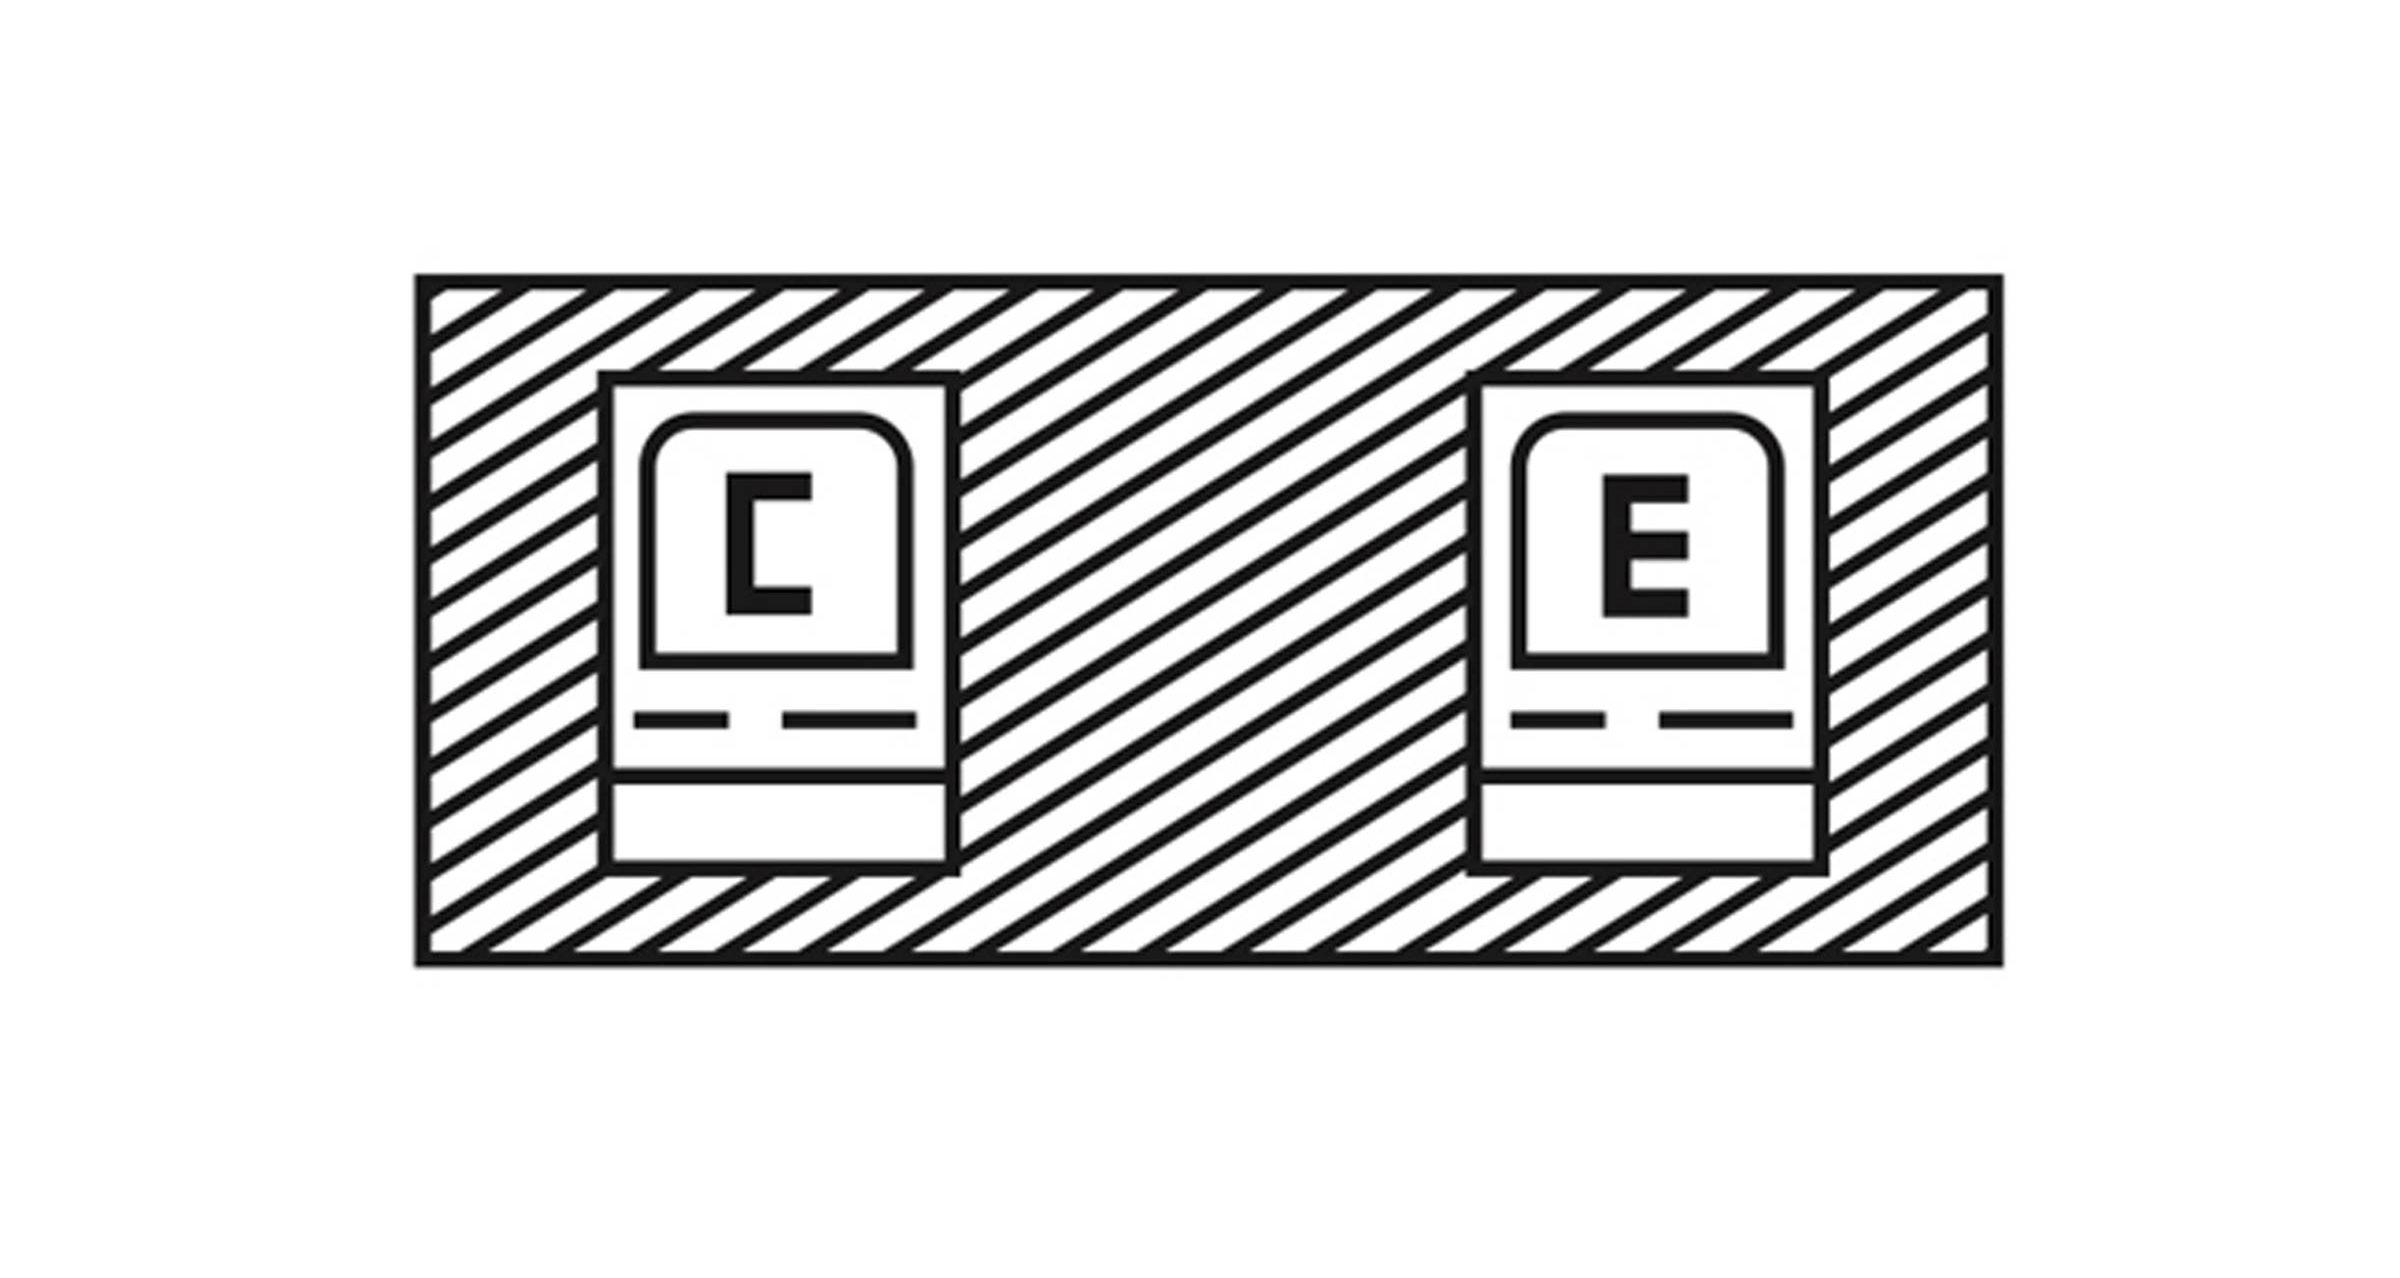 логотип cav empt